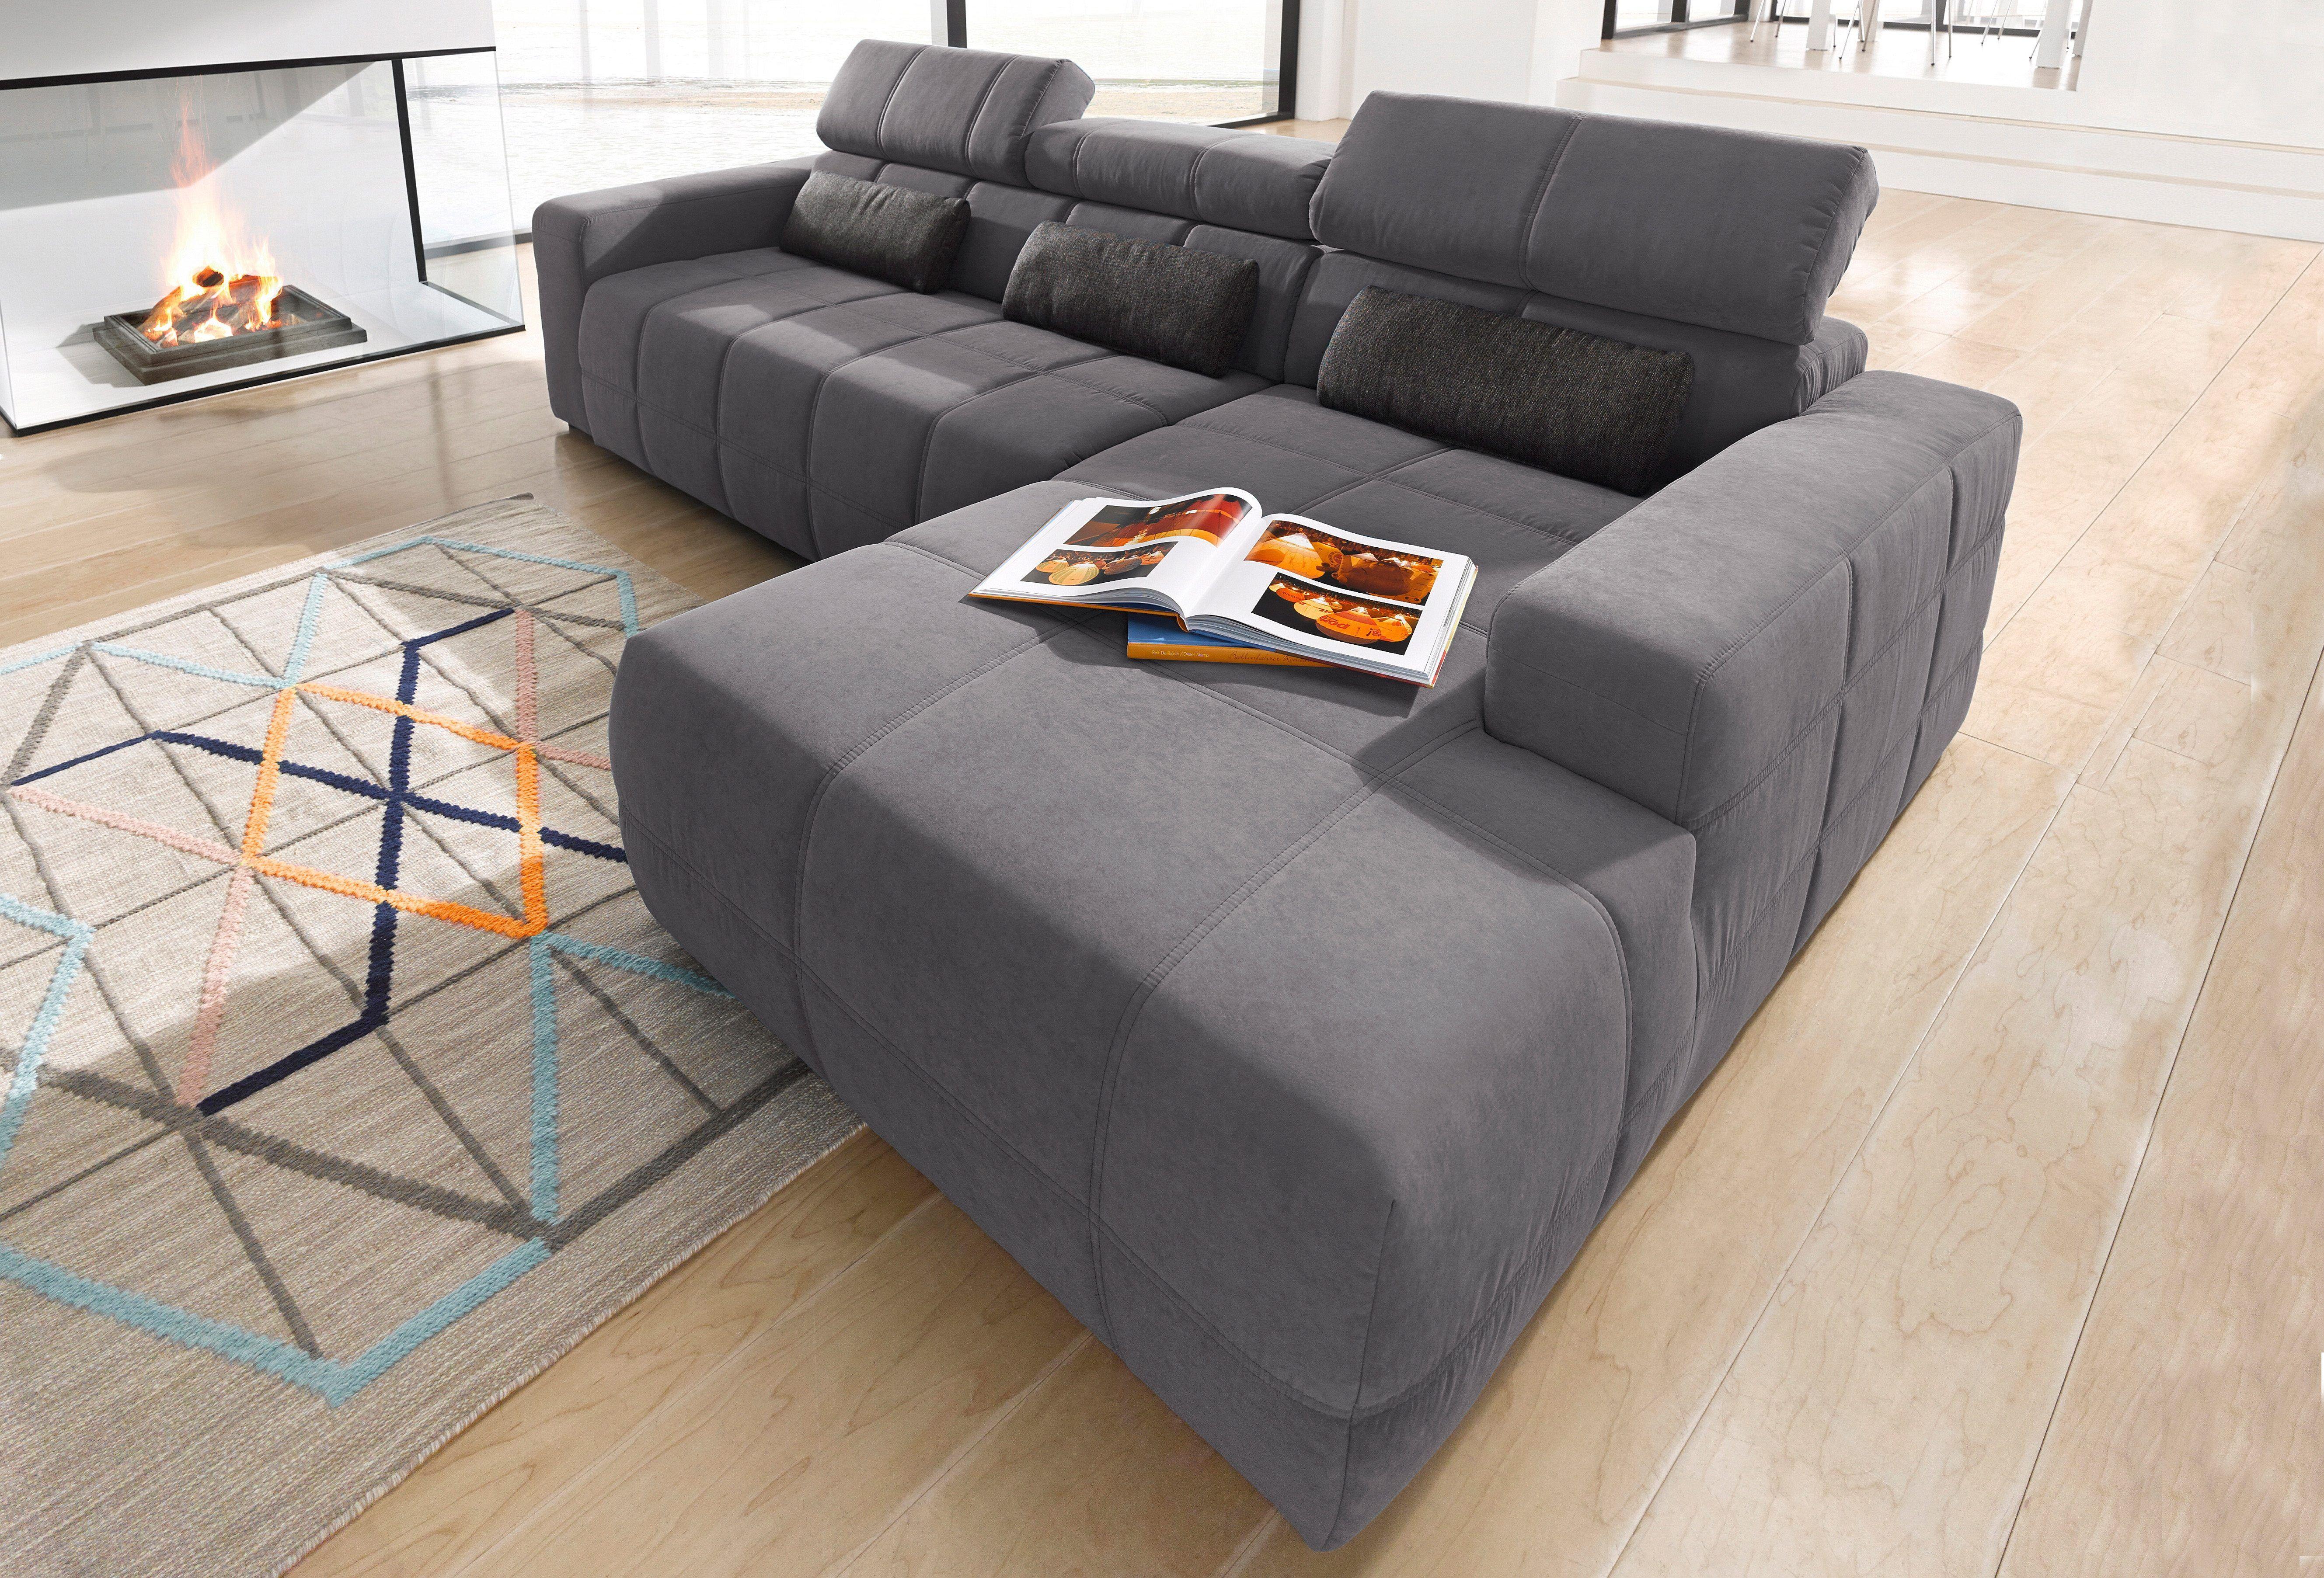 Wundervoll Sofa Sitztiefenverstellung Galerie Von Ecksofa Grau, Mit Sitztiefenverstellung, Recamiere Rechts, Fsc®-zertifiziert,